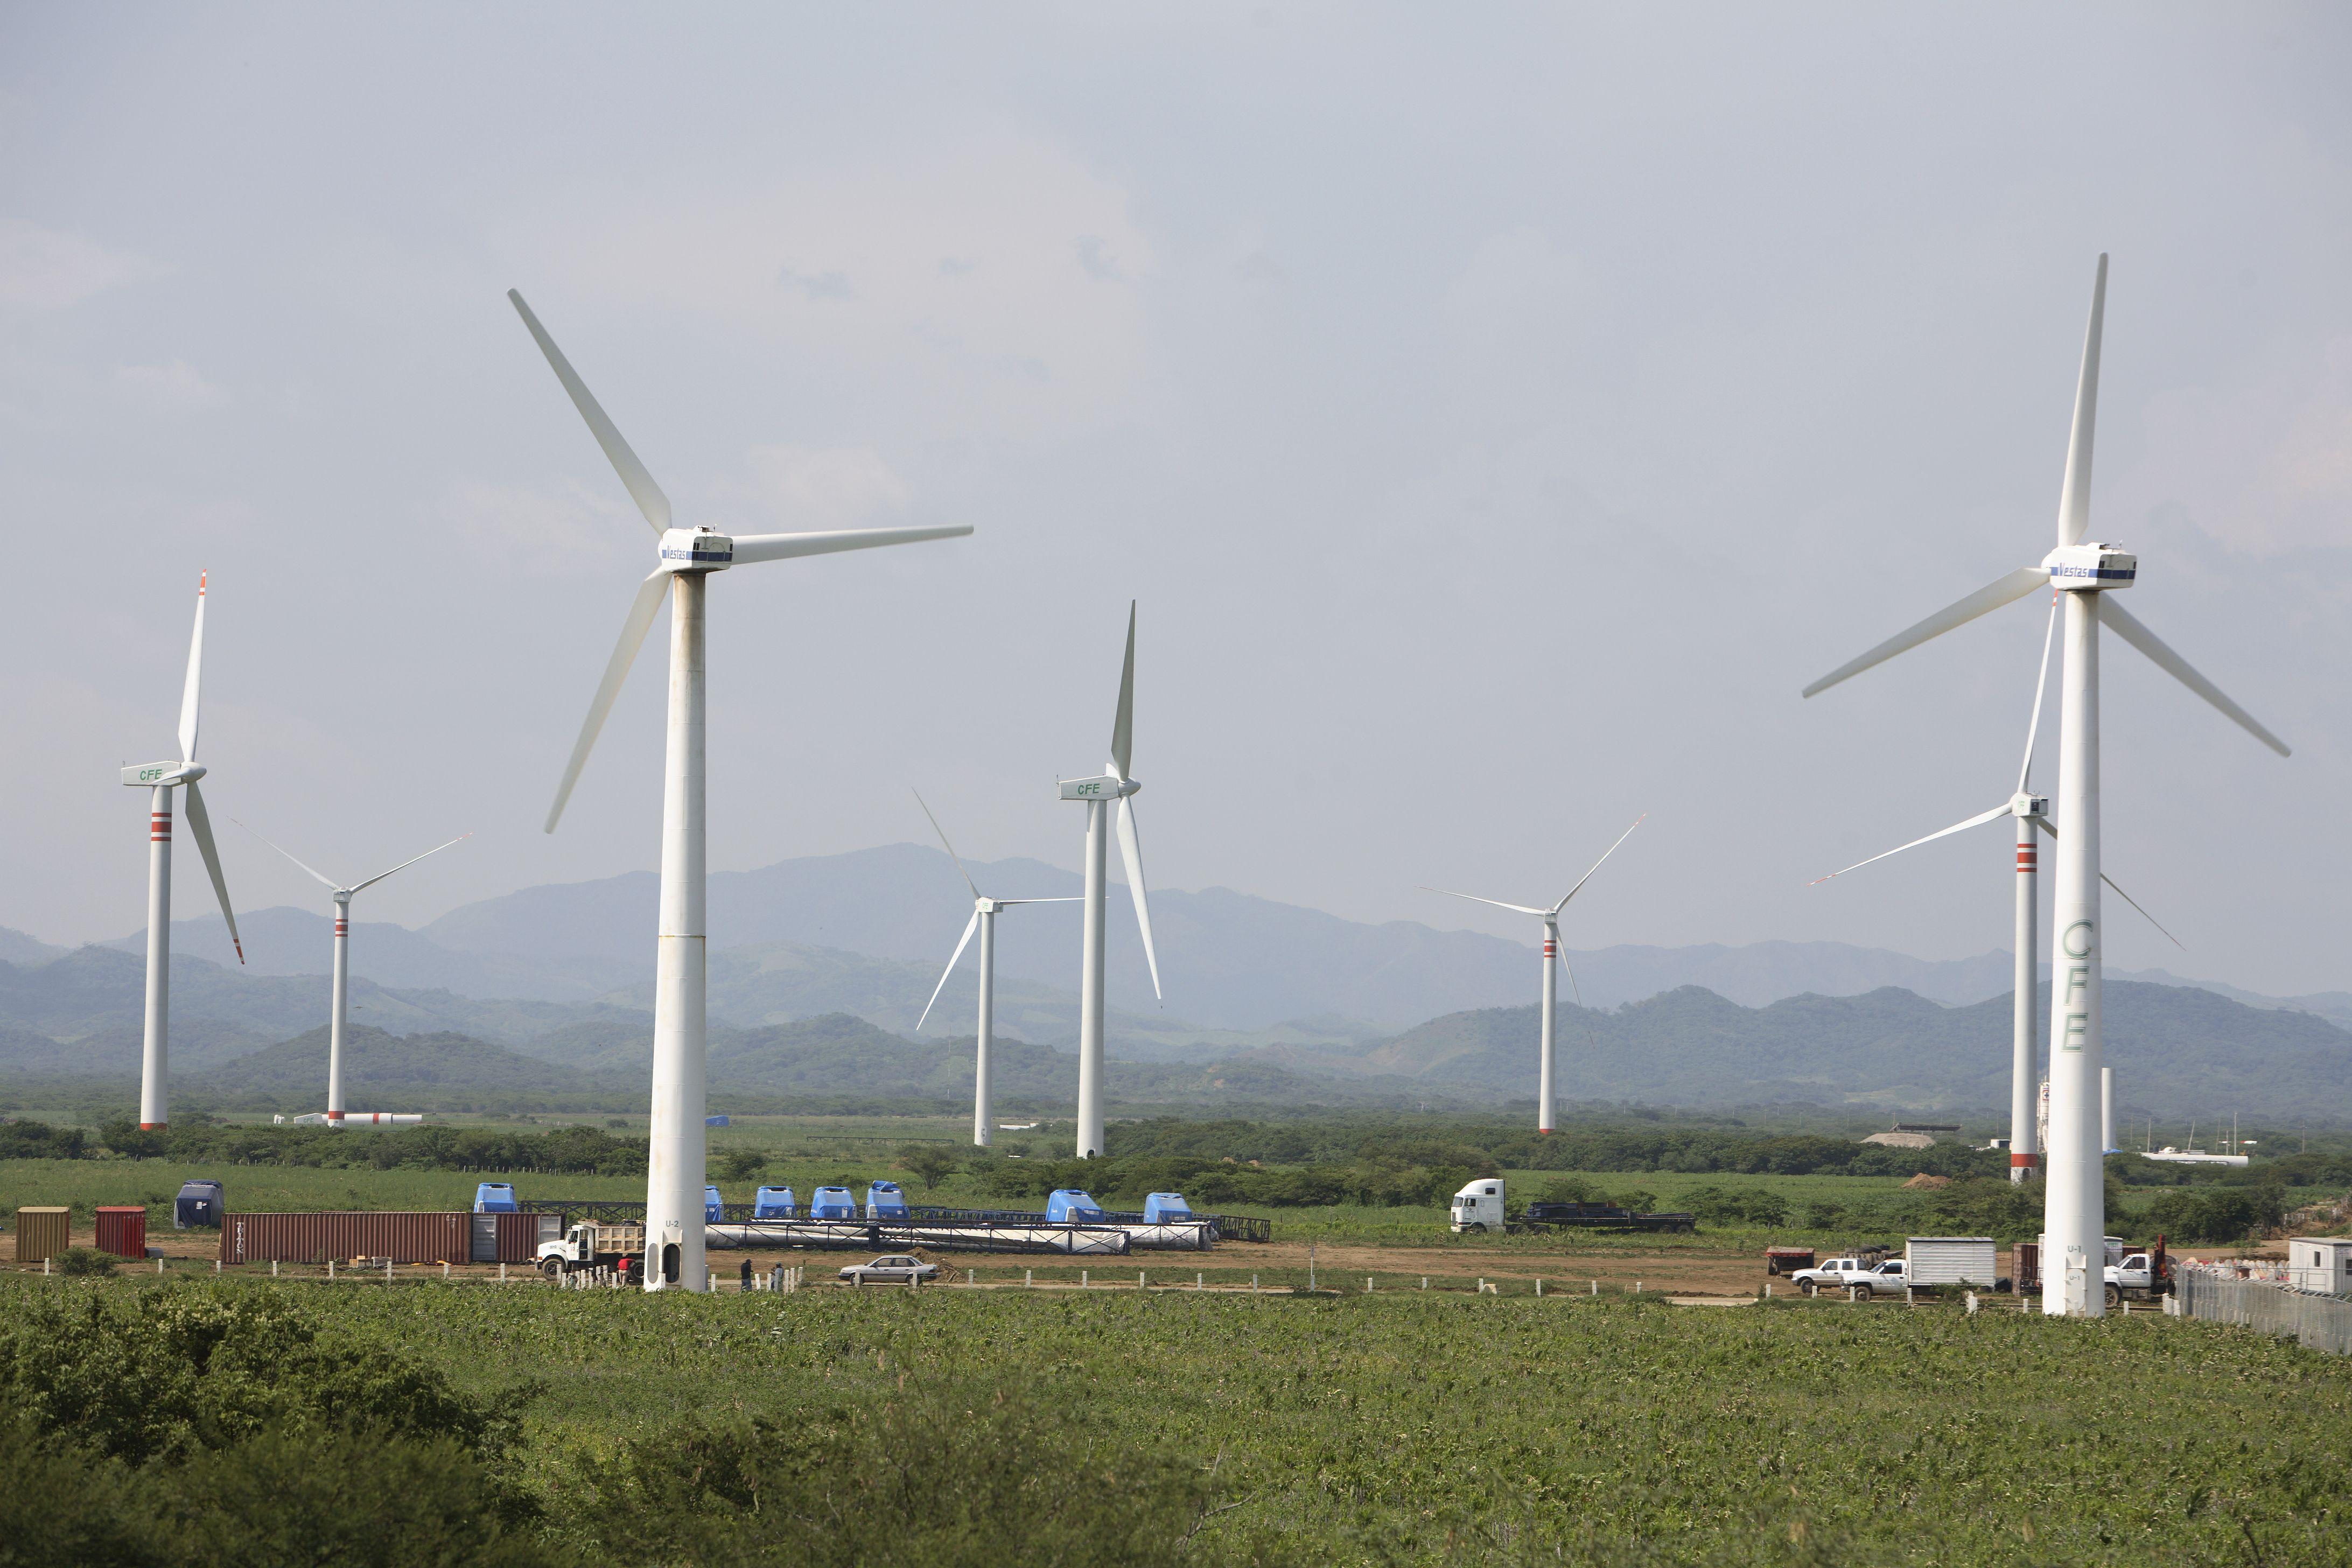 Eólica en México: proyecto eólico de Sempra con 50 aerogeneradores